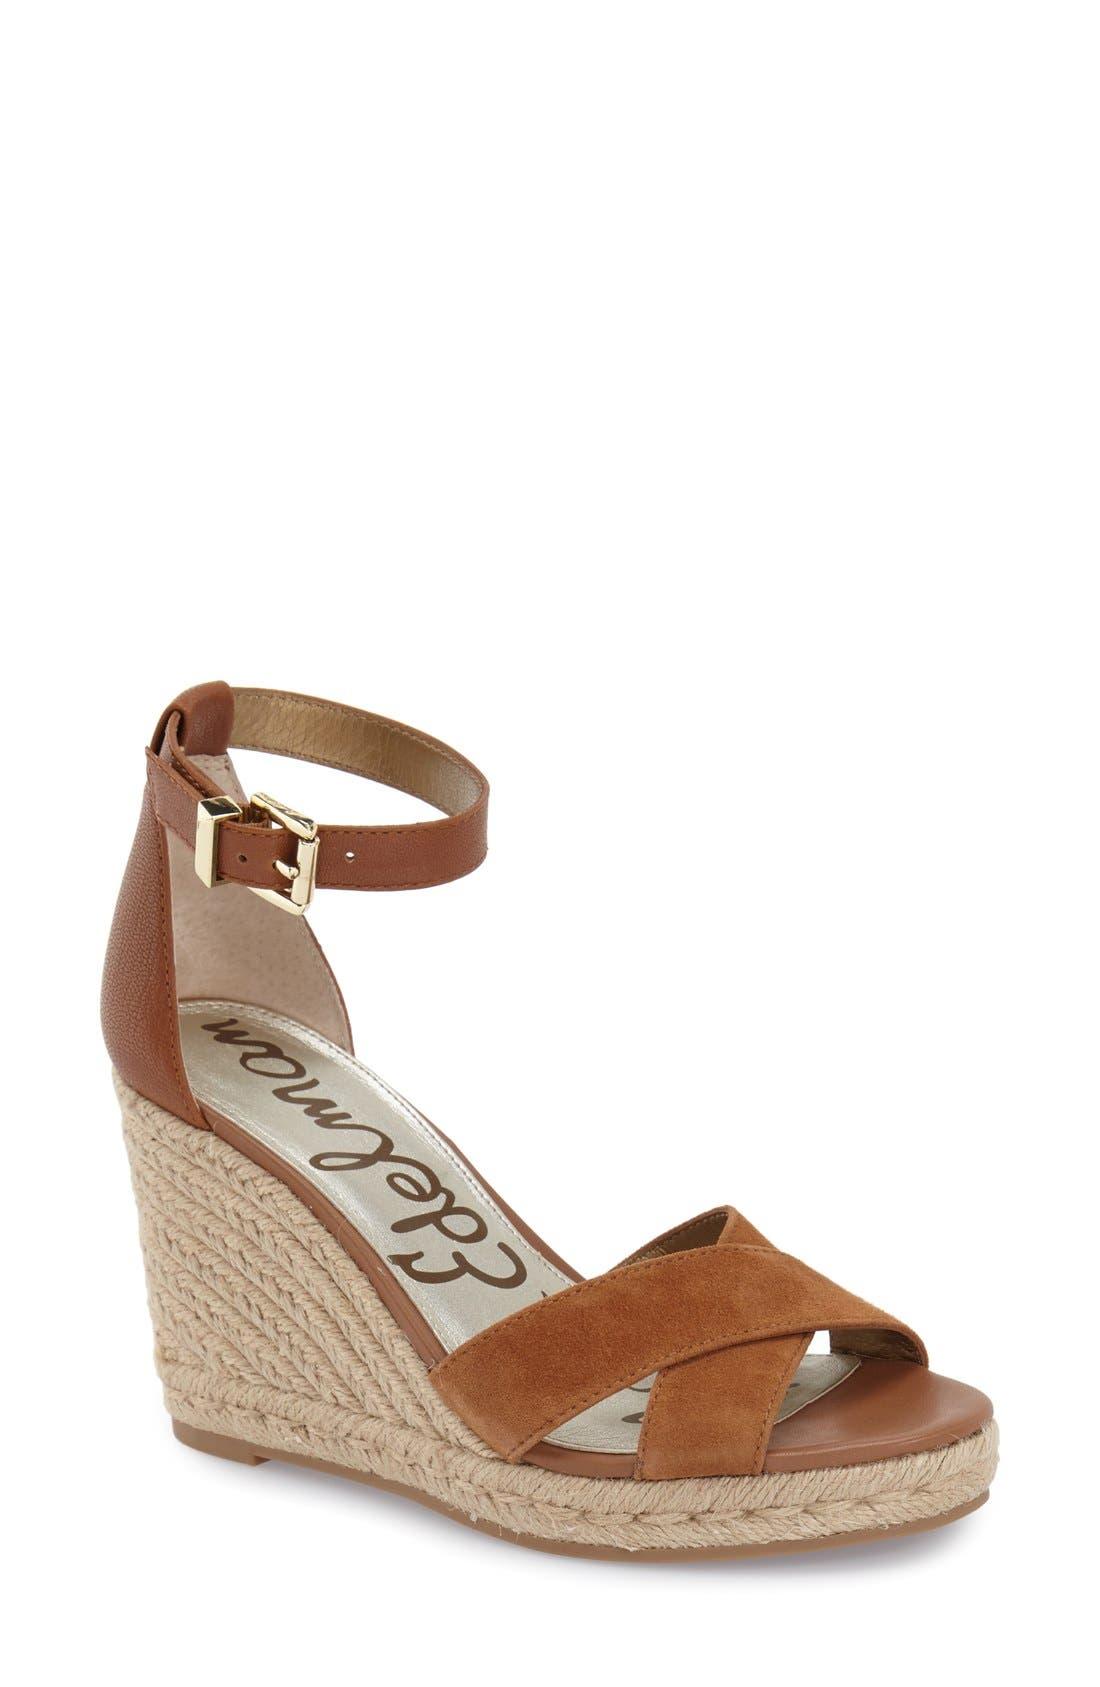 'Brenda' Espadrille Wedge Sandal,                             Main thumbnail 1, color,                             Saddle